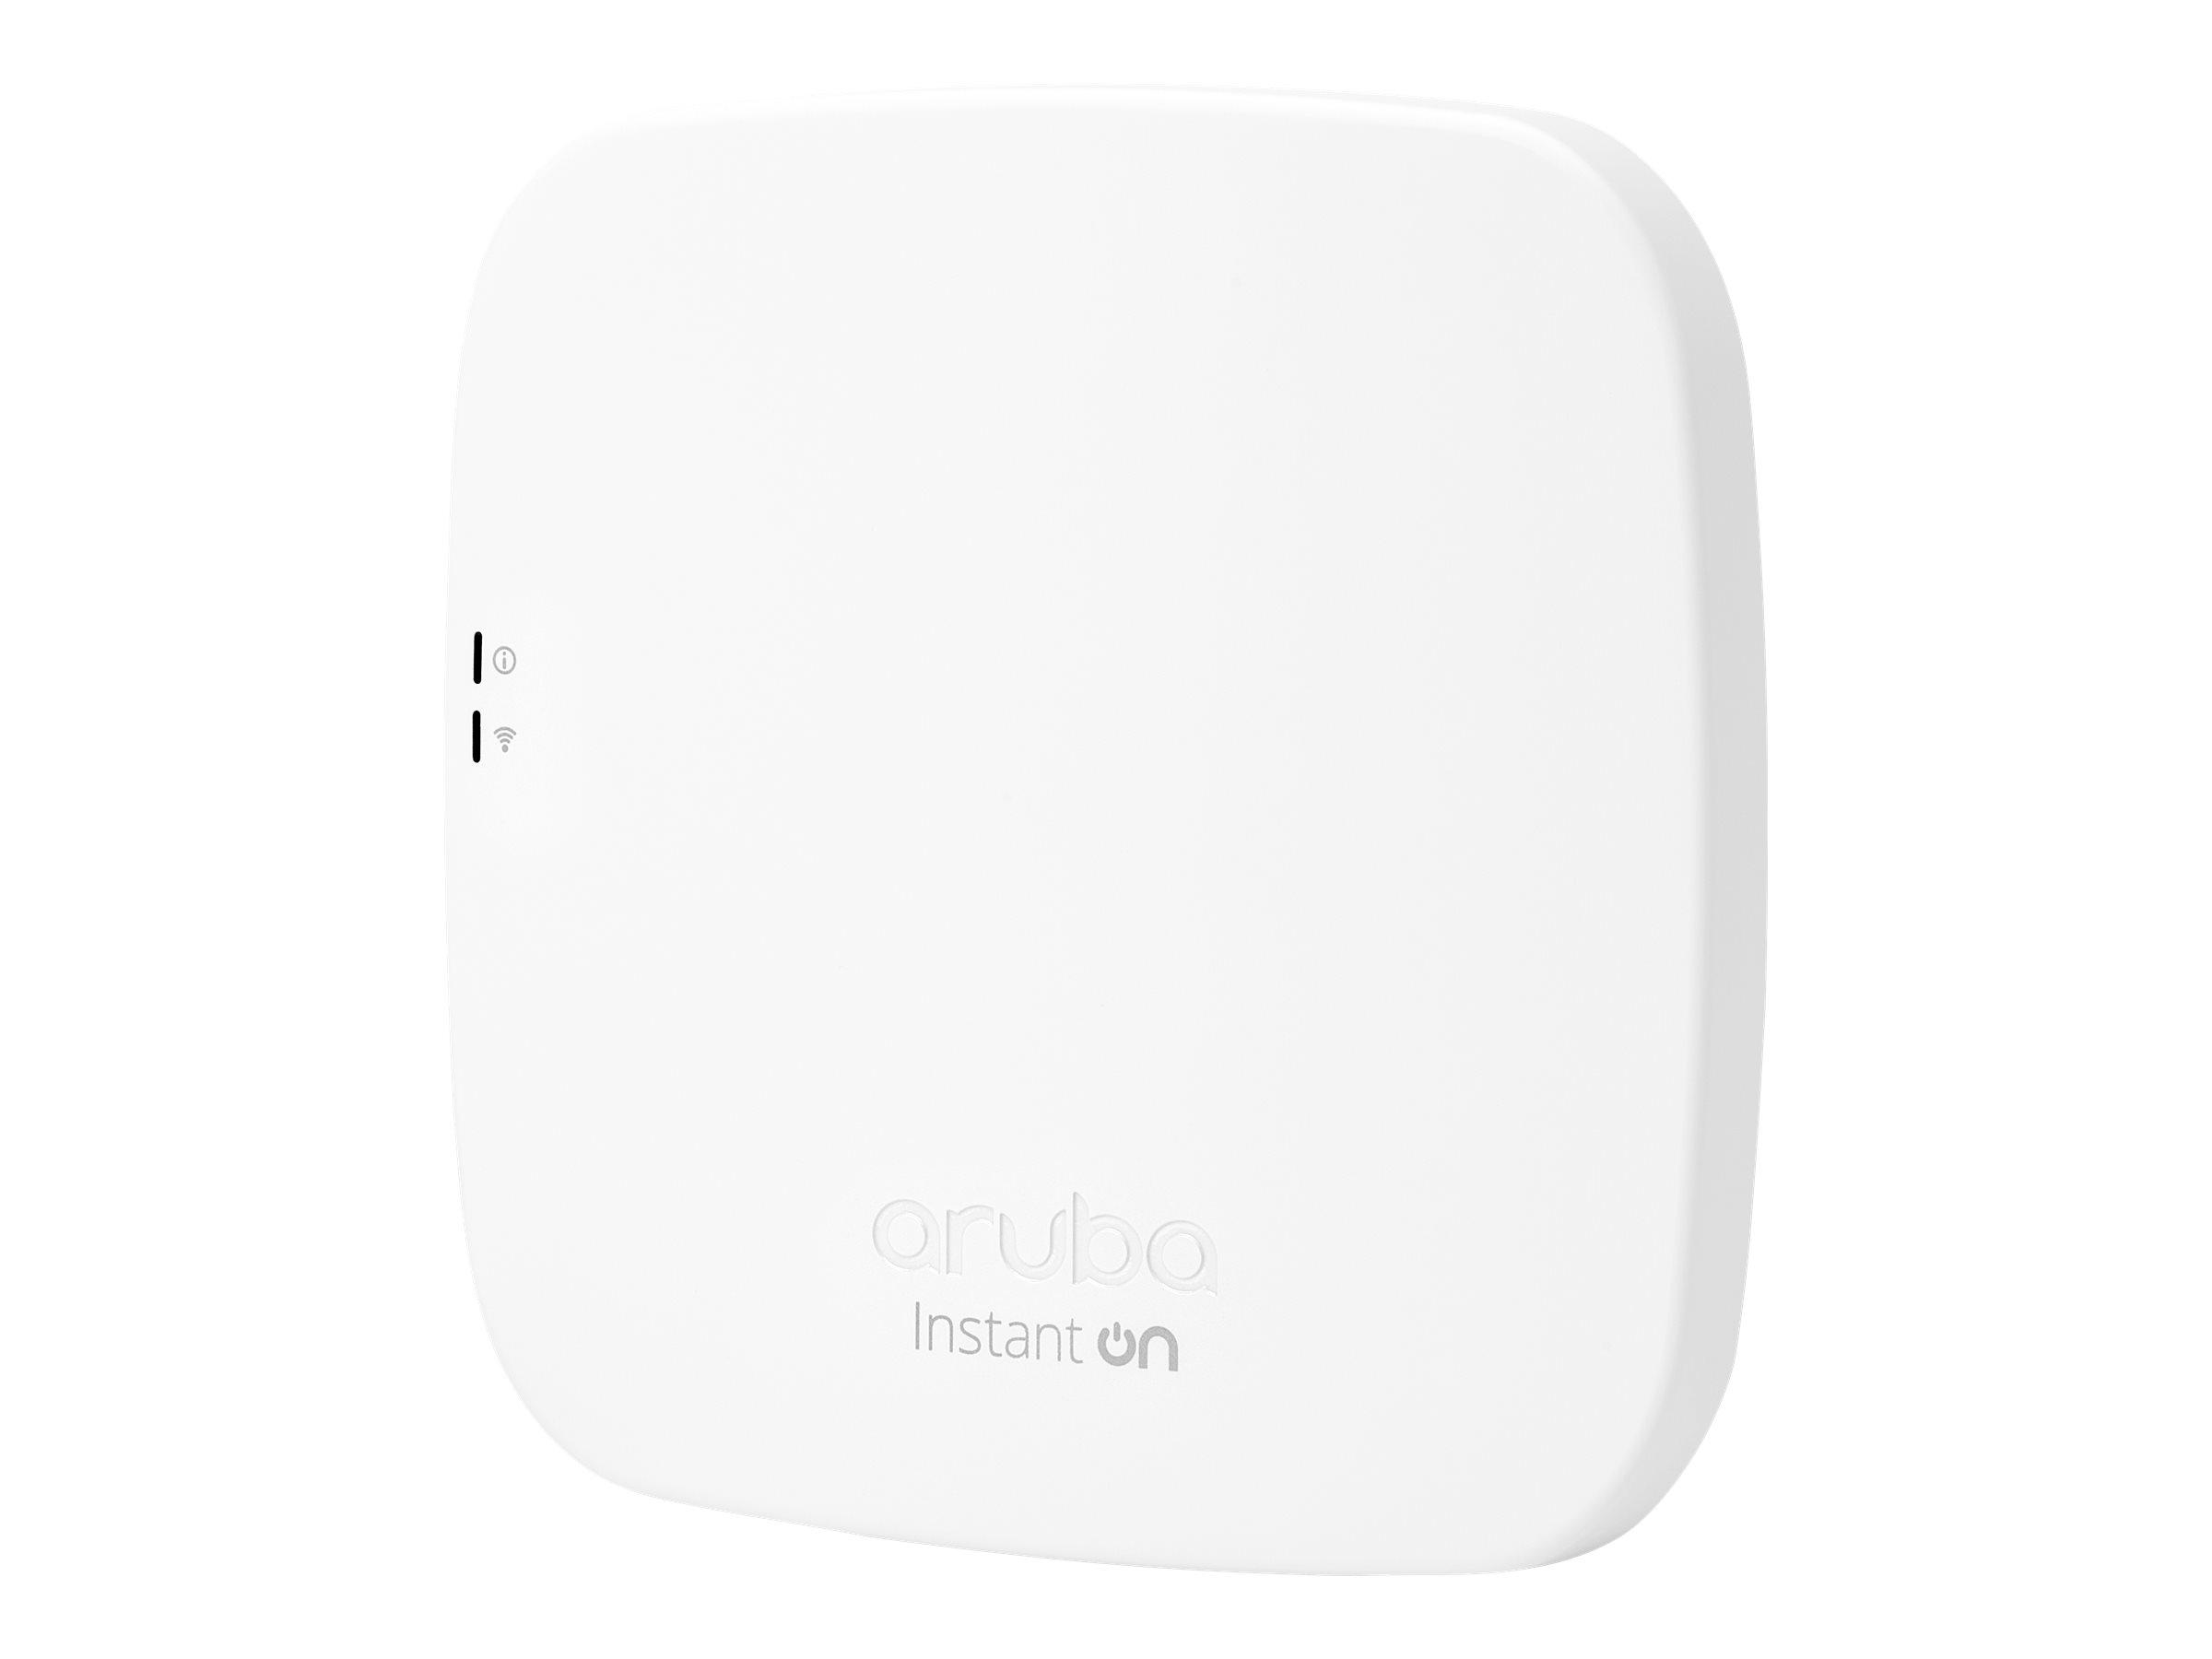 HPE Aruba Instant ON AP12 (EG) - Funkbasisstation - 802.11ac Wave 2 - Bluetooth, Wi-Fi 5 - 2.4 GHz, 5 GHz